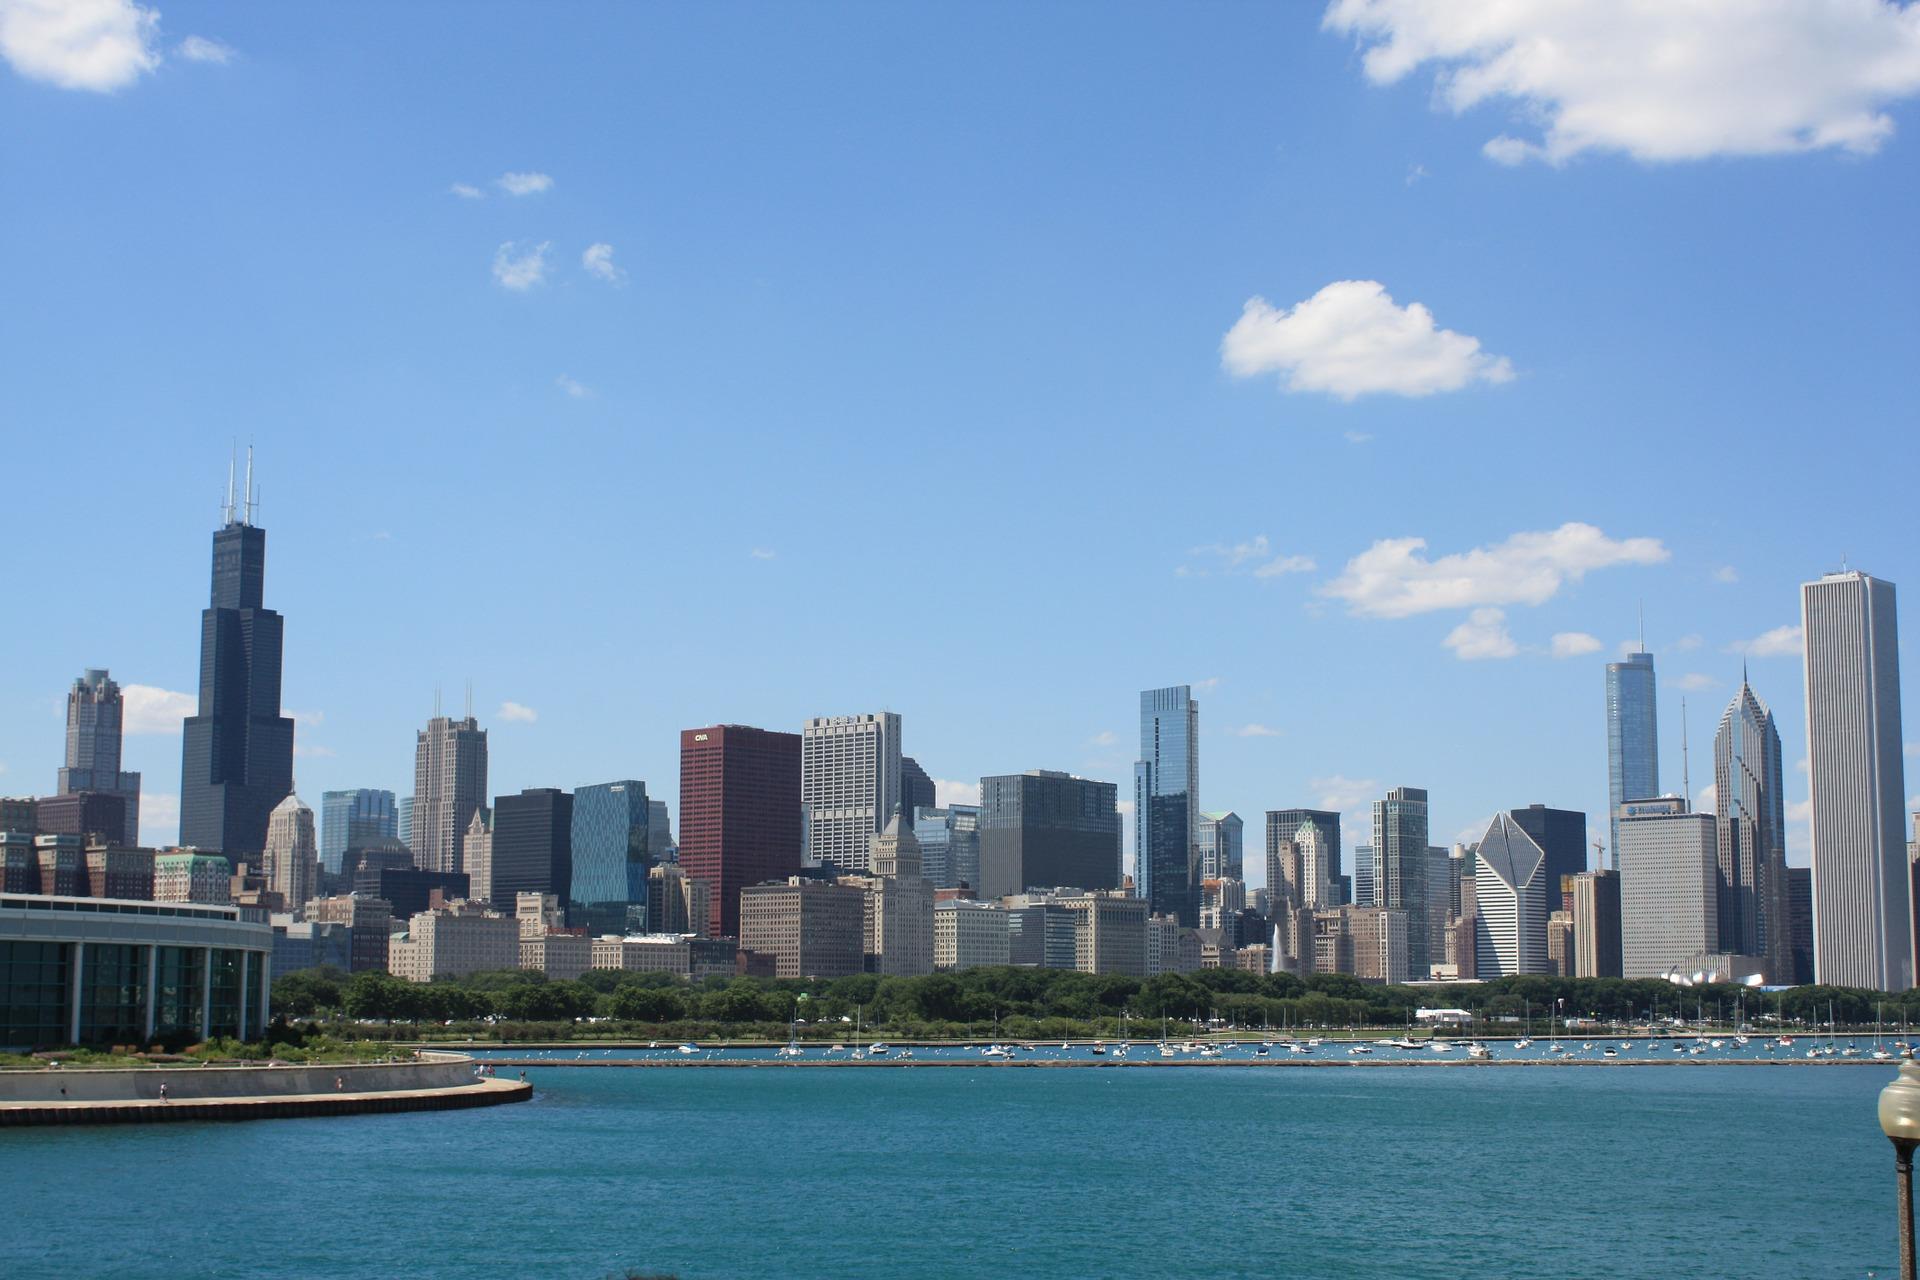 chicago-952469_1920